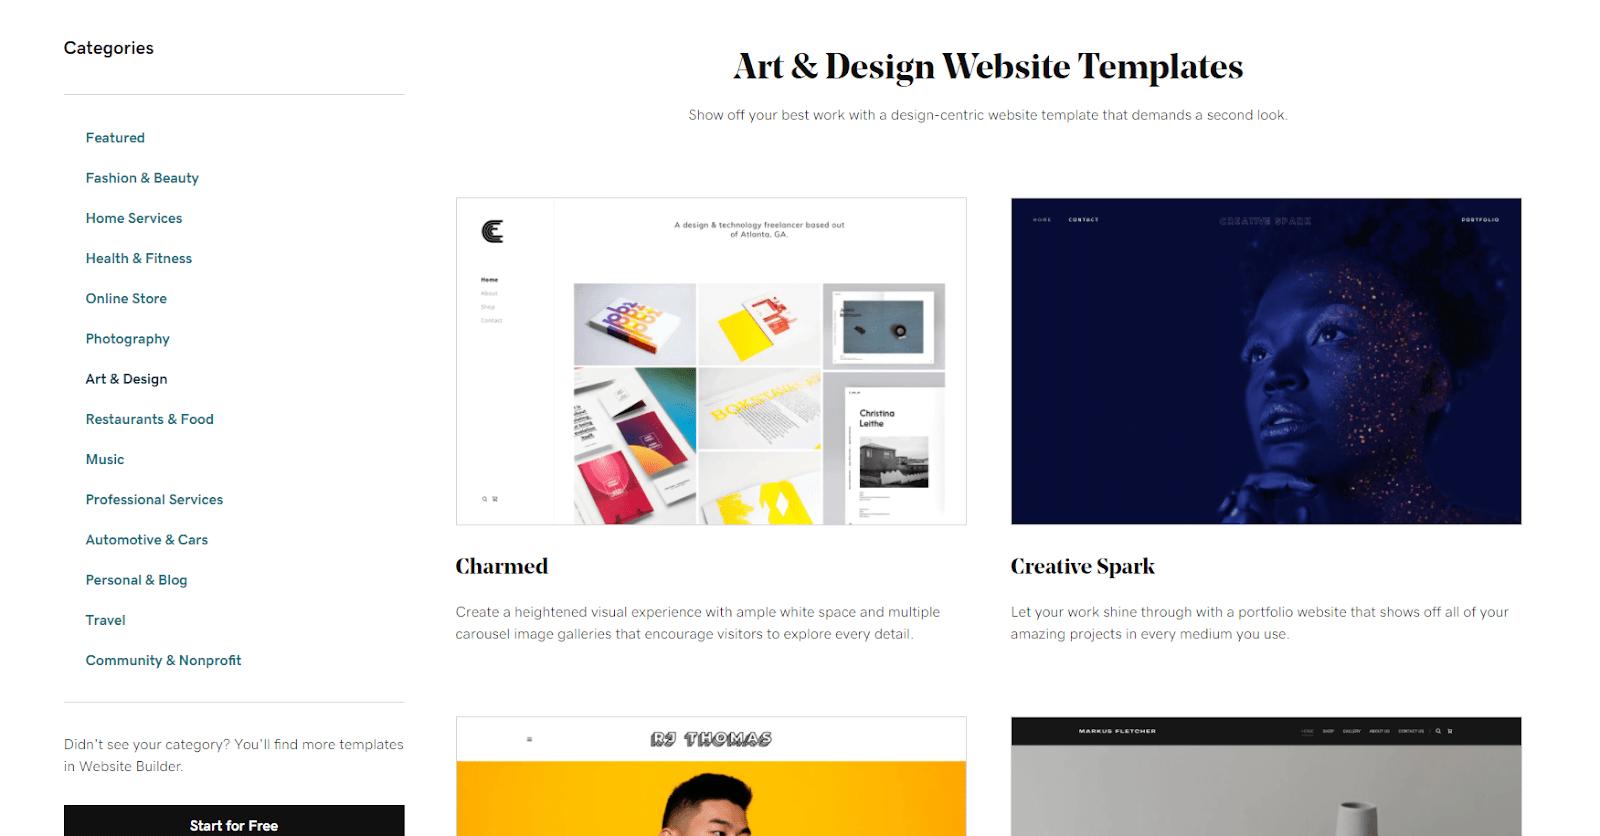 GoDaddy Art & Design templates